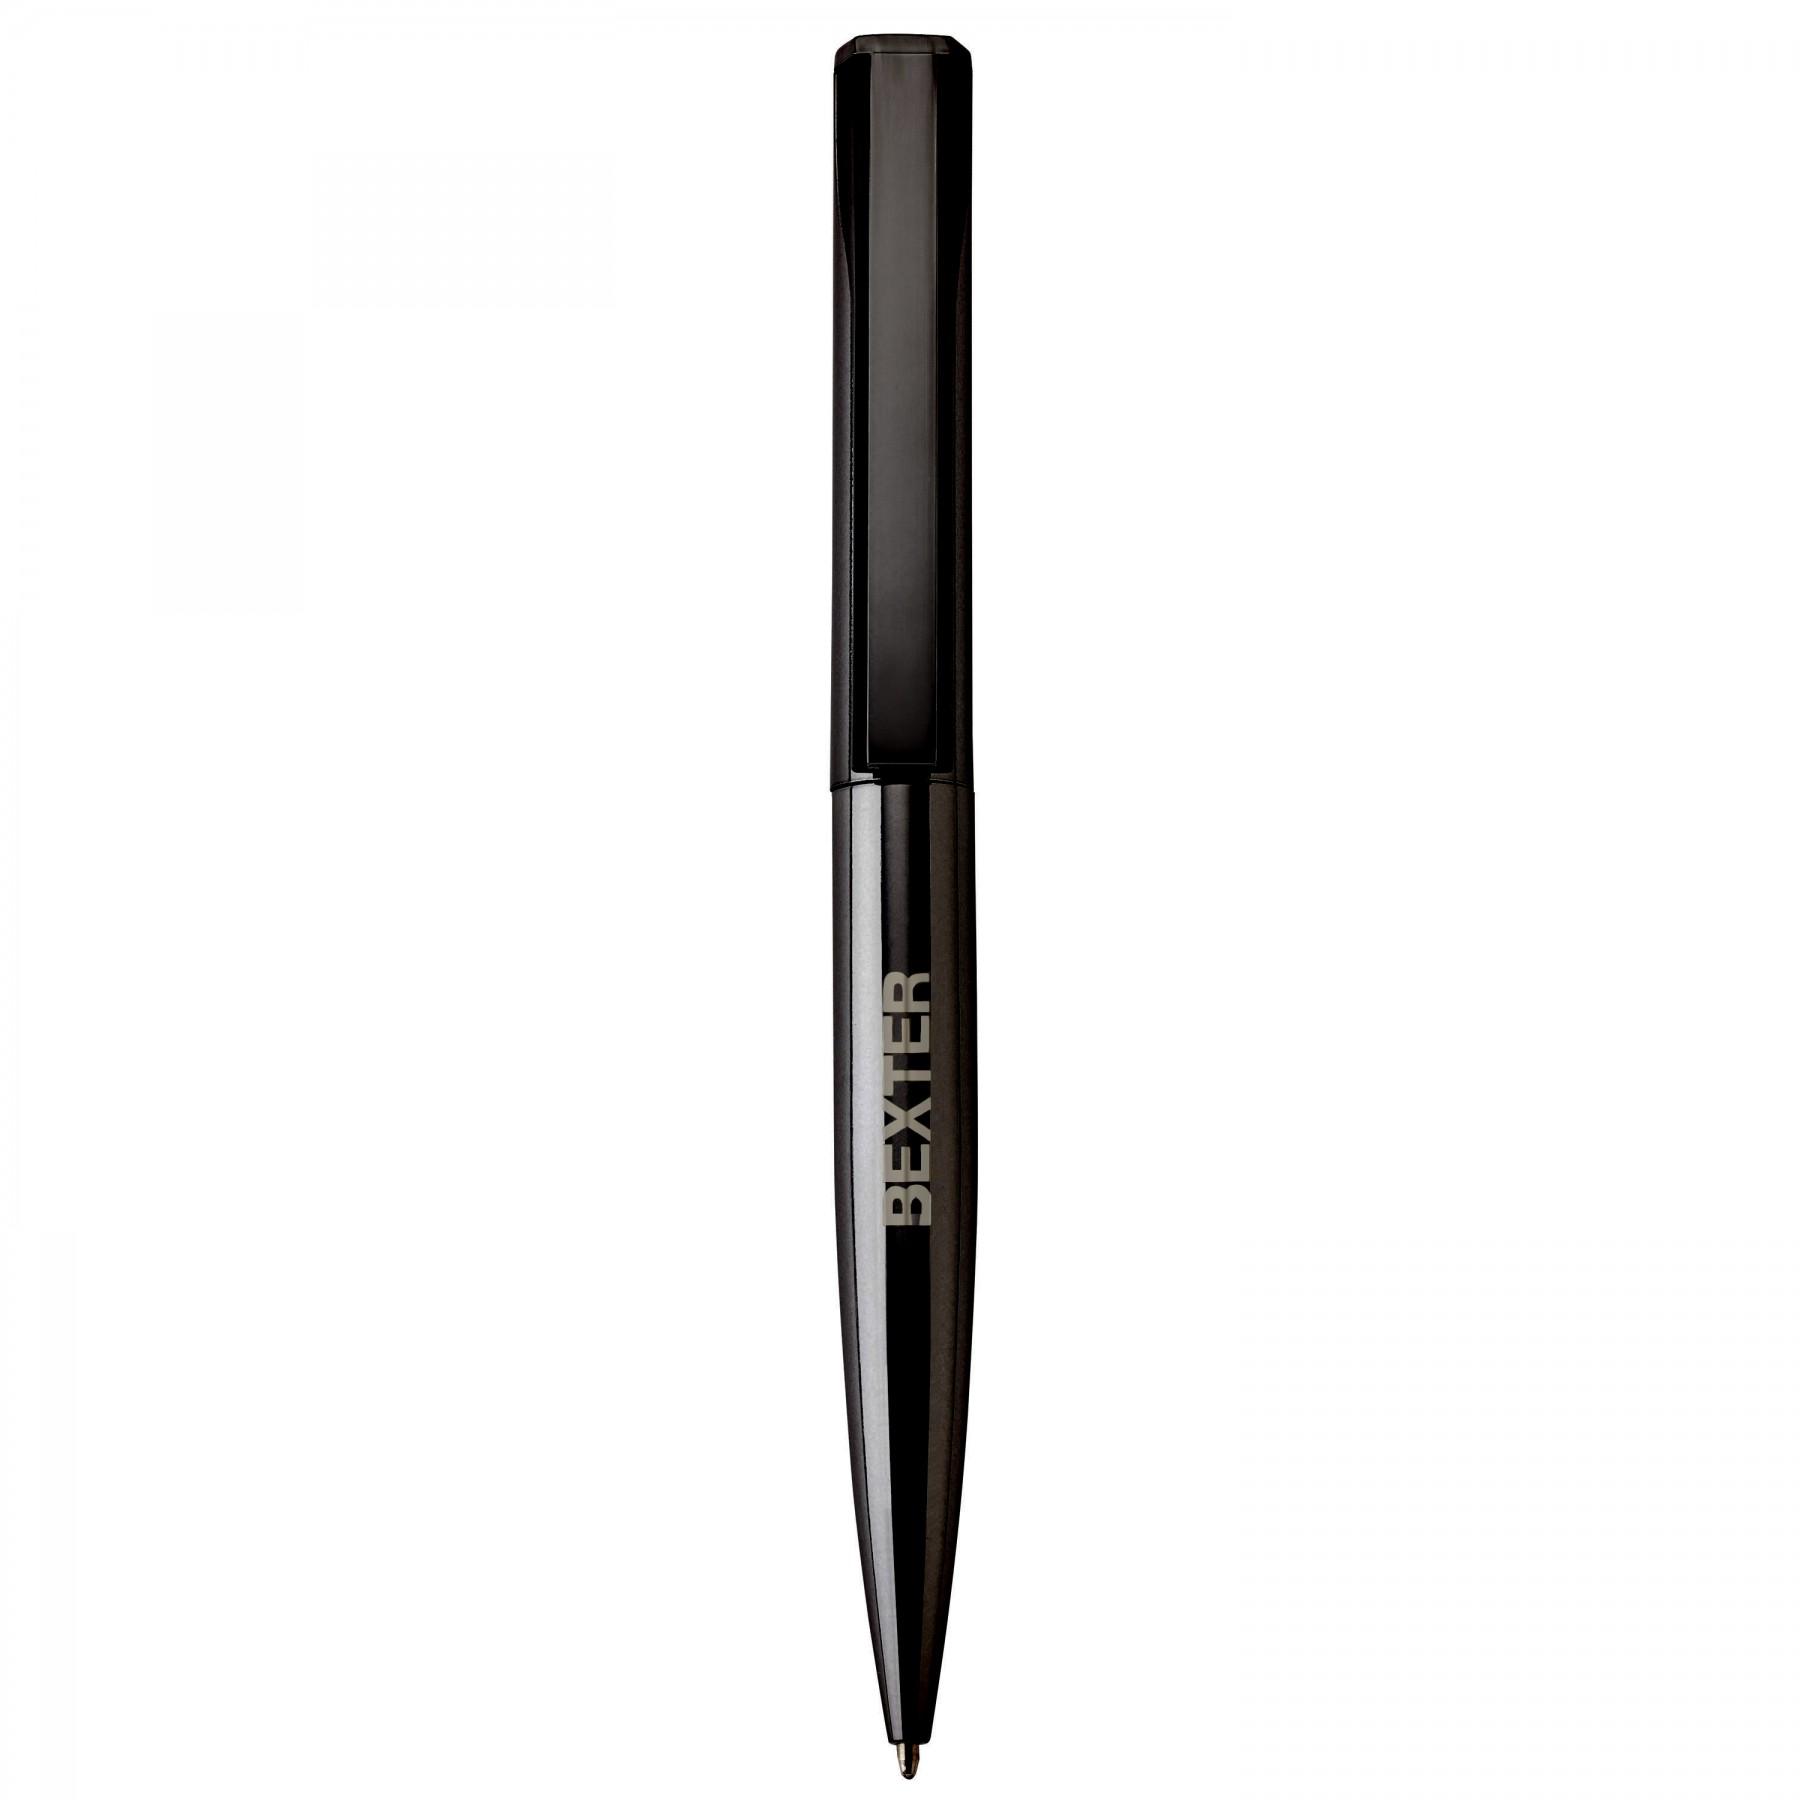 Dean Ballpoint Pen, G3114, Laser Engraved